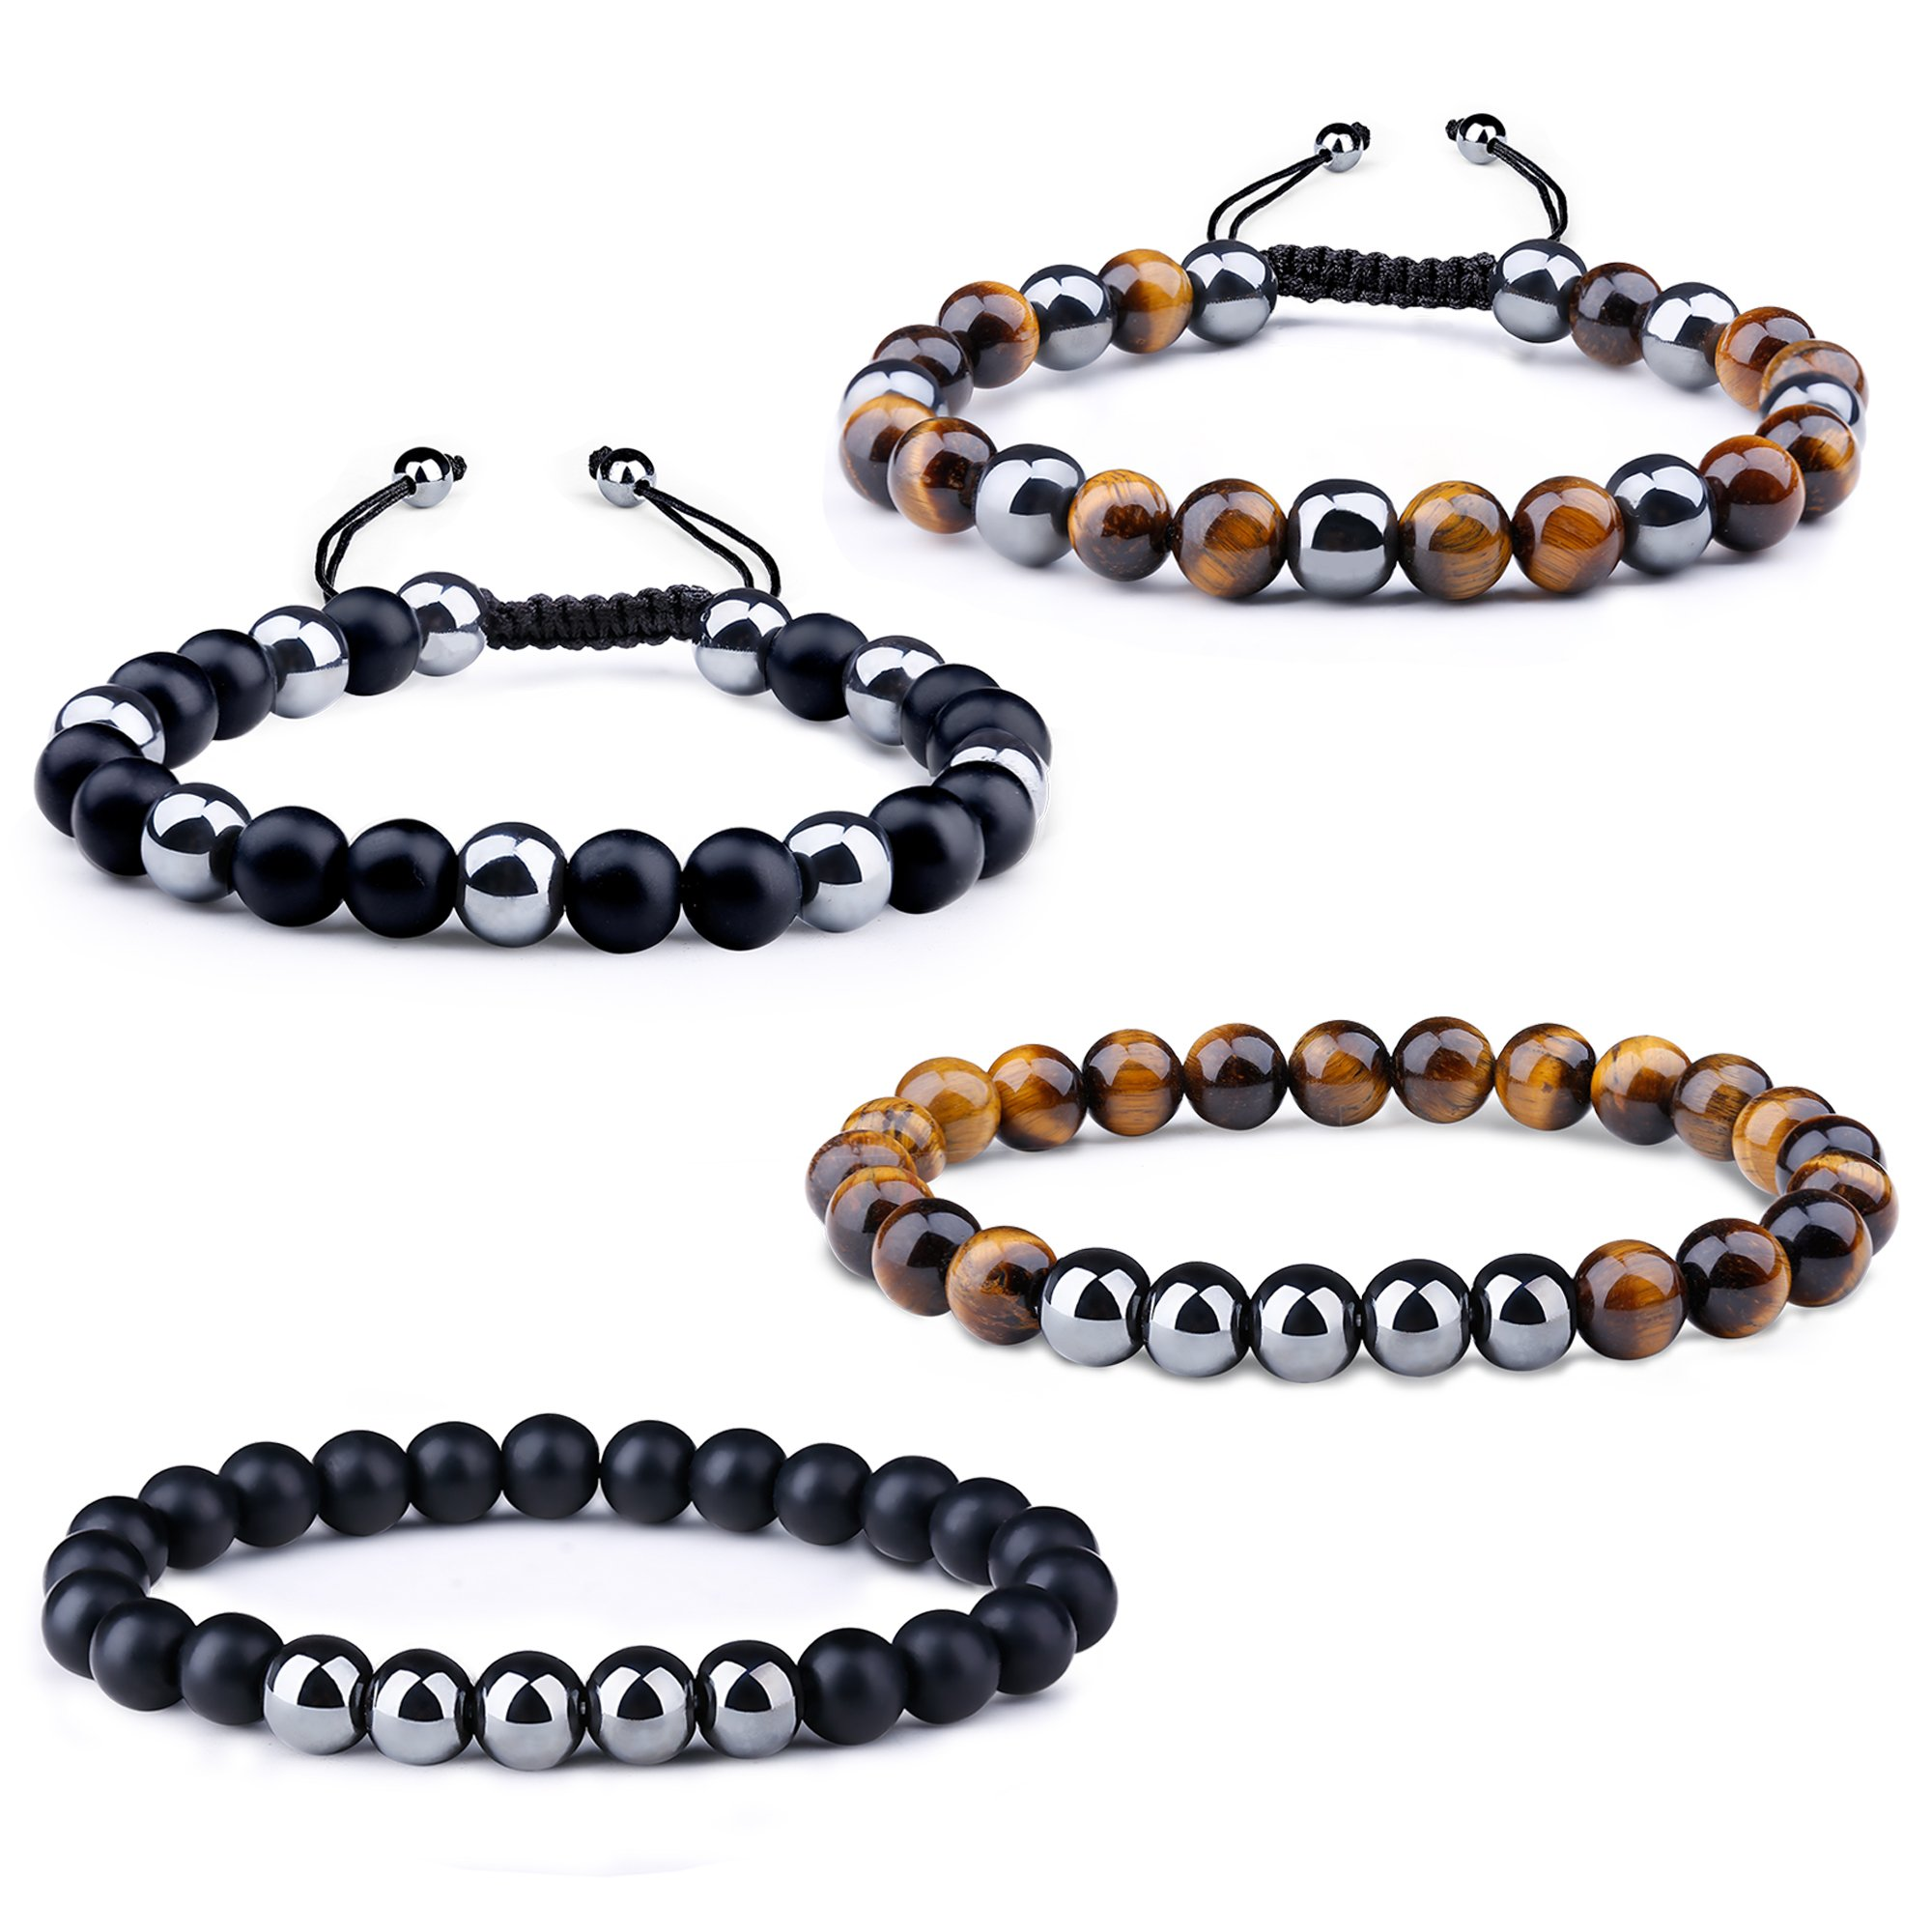 Milacolato 4Pcs Healing Energy Natural Tiger Eye Stone Lava Beads Bracelet Men Women Hematite Therapy Beads Stretch Bracelet Adjustable Tiger Eye